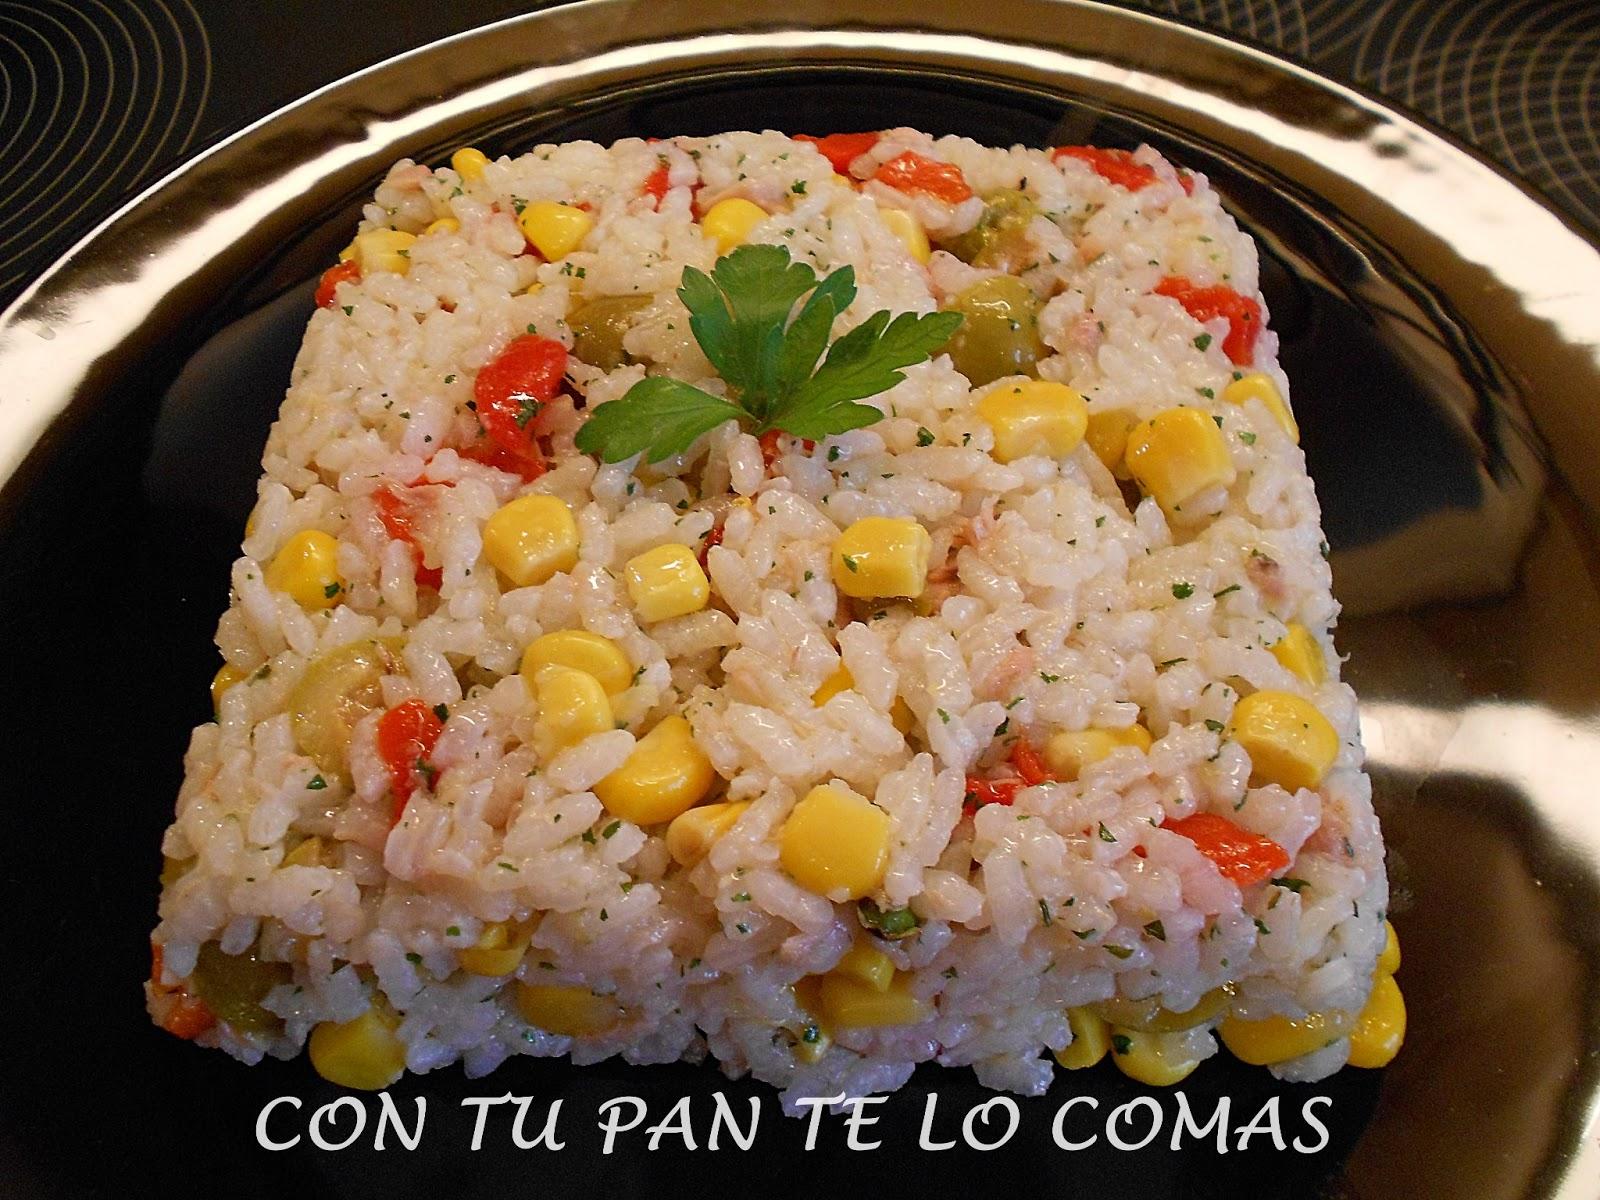 Con tu pan te lo comas ensalada de arroz - Ensalada de arroz light ...